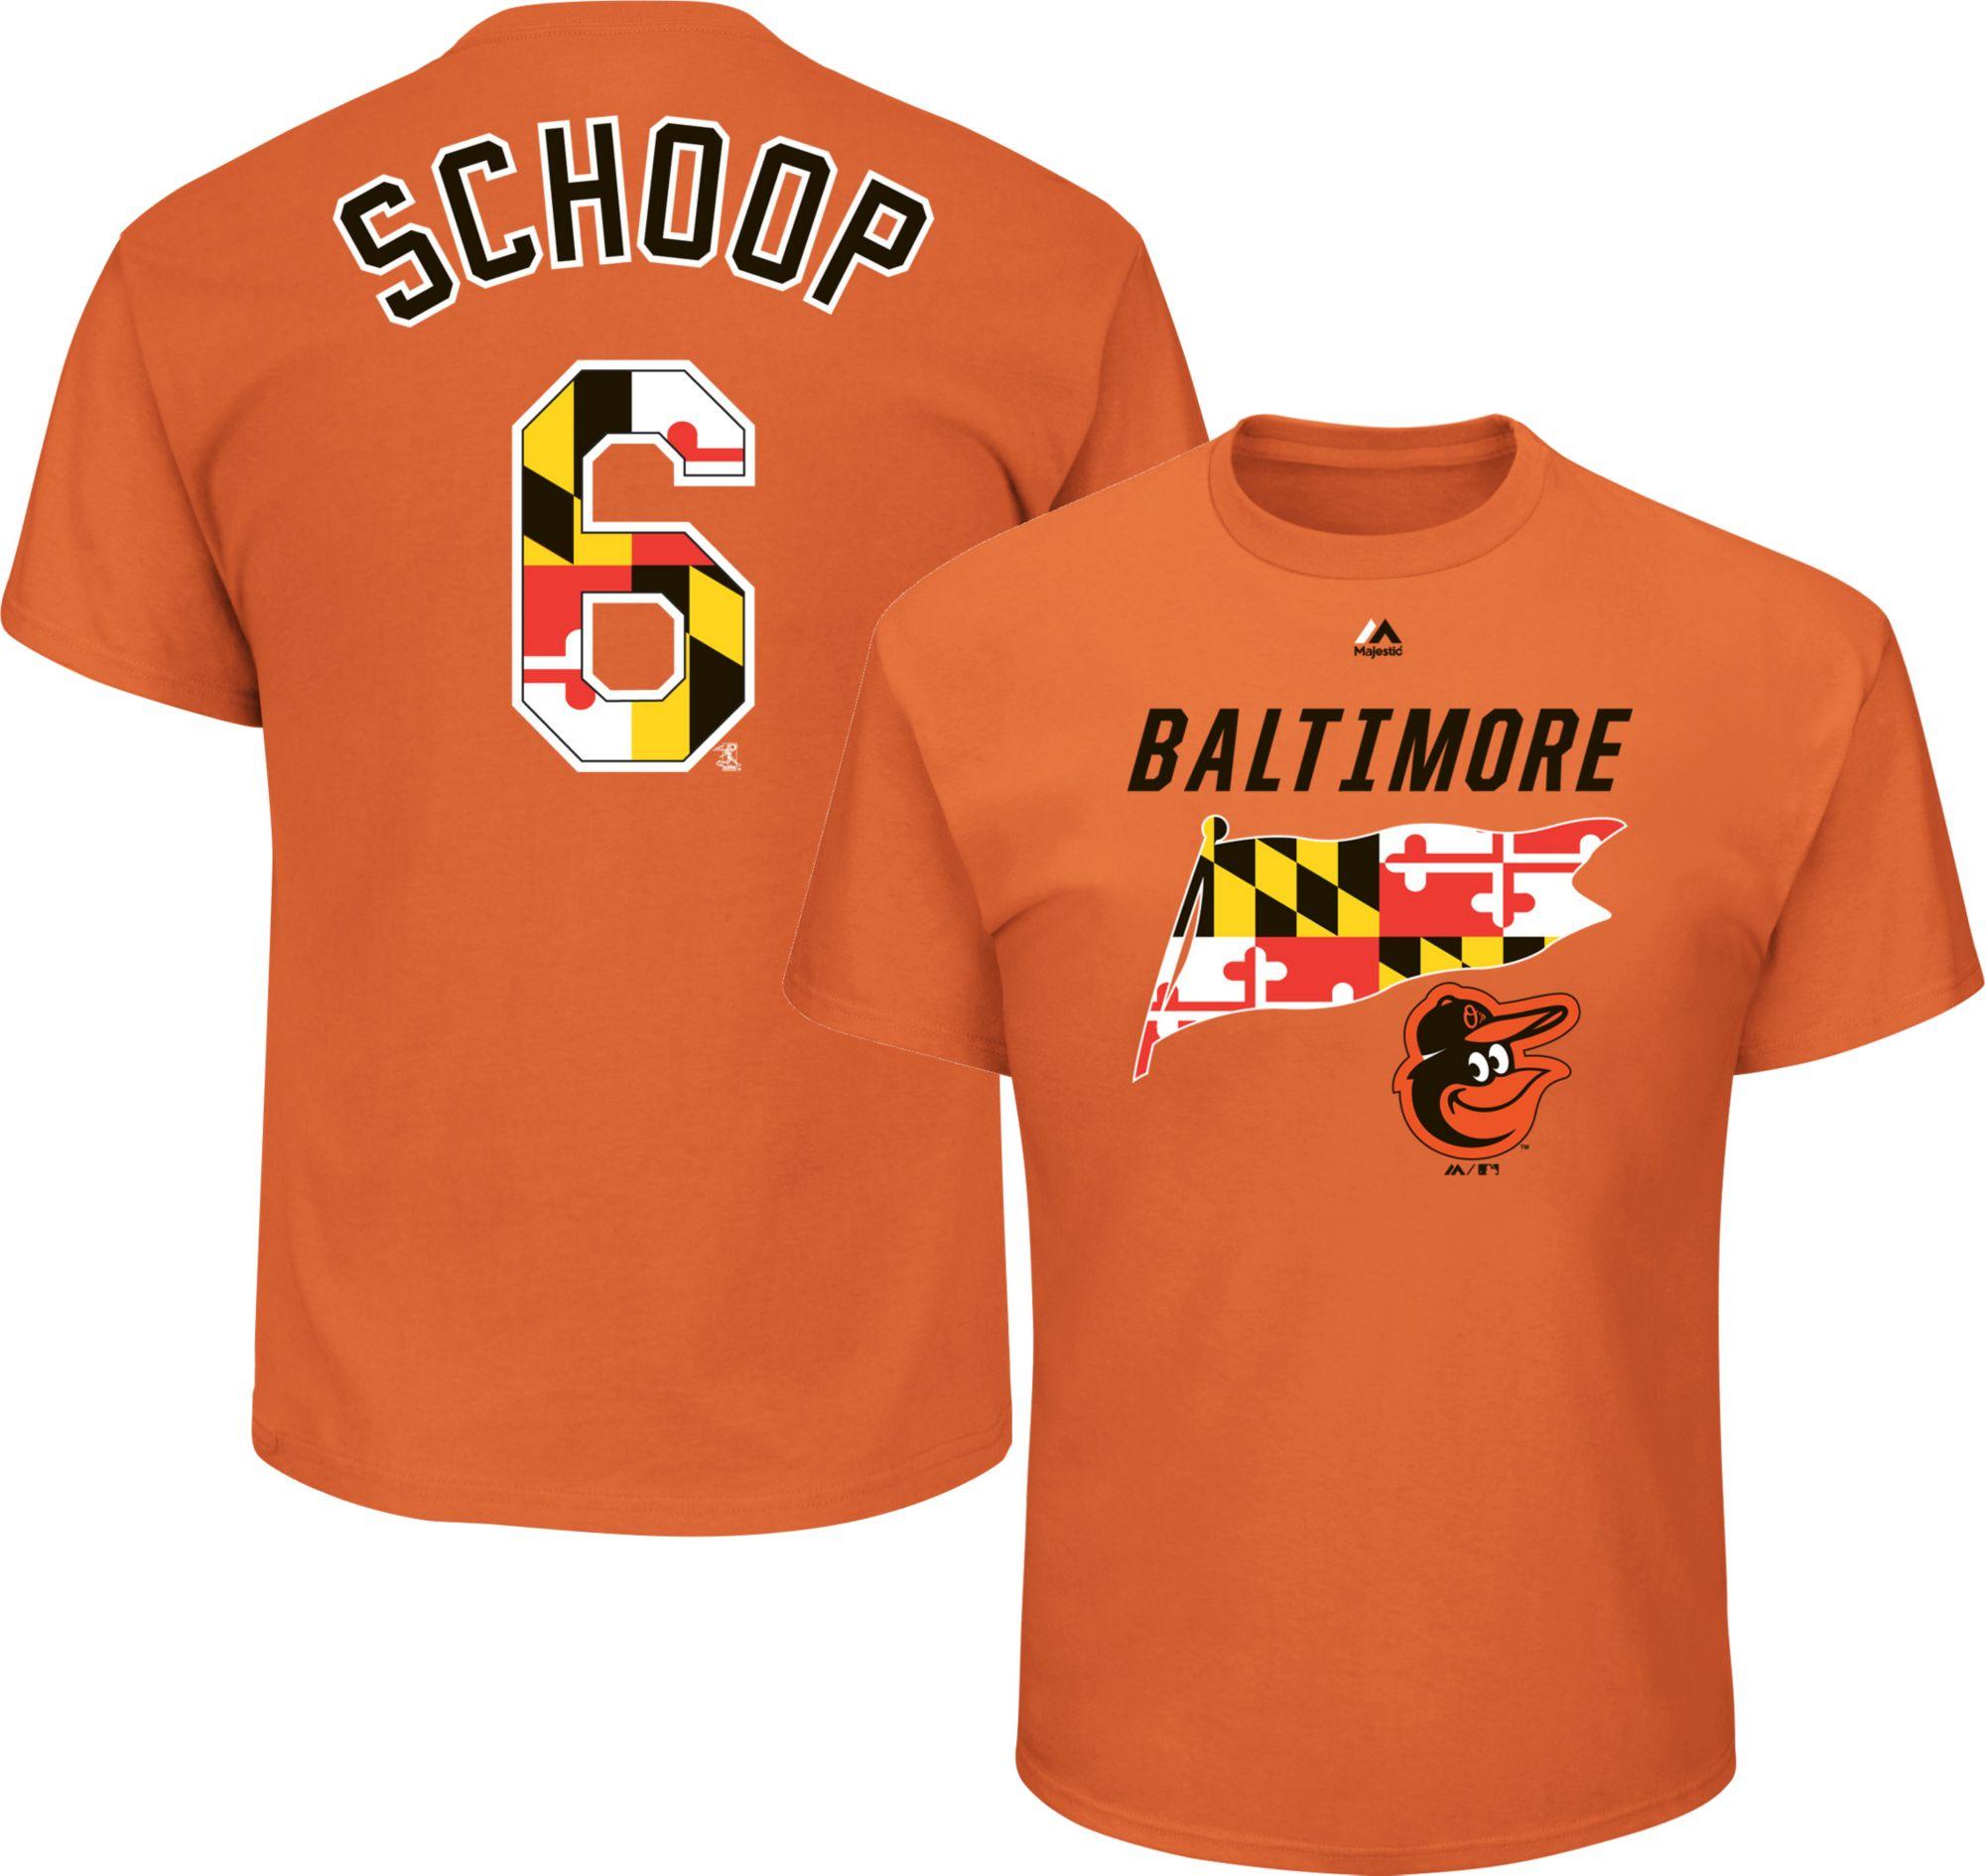 eb8227d19 ... Base Jersey - Grey Majestic Mens Baltimore Orioles Jonathan Schoop 6  Orange T-S ...